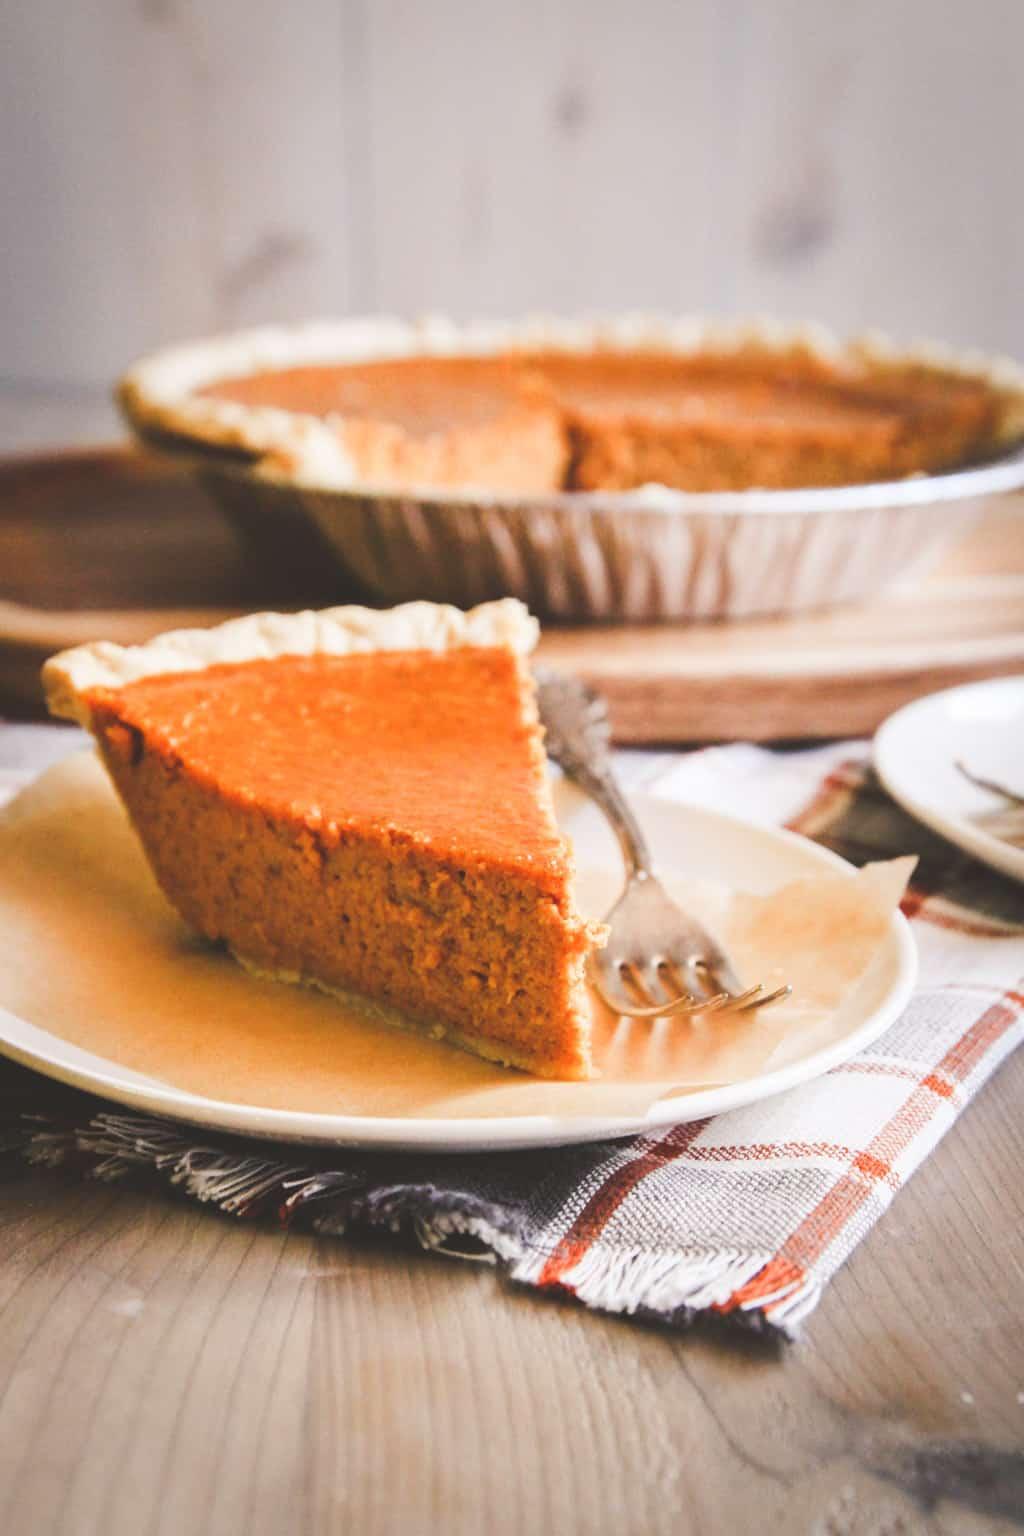 Easy 5 Ingre Nt Pumpkin Pie Recipe